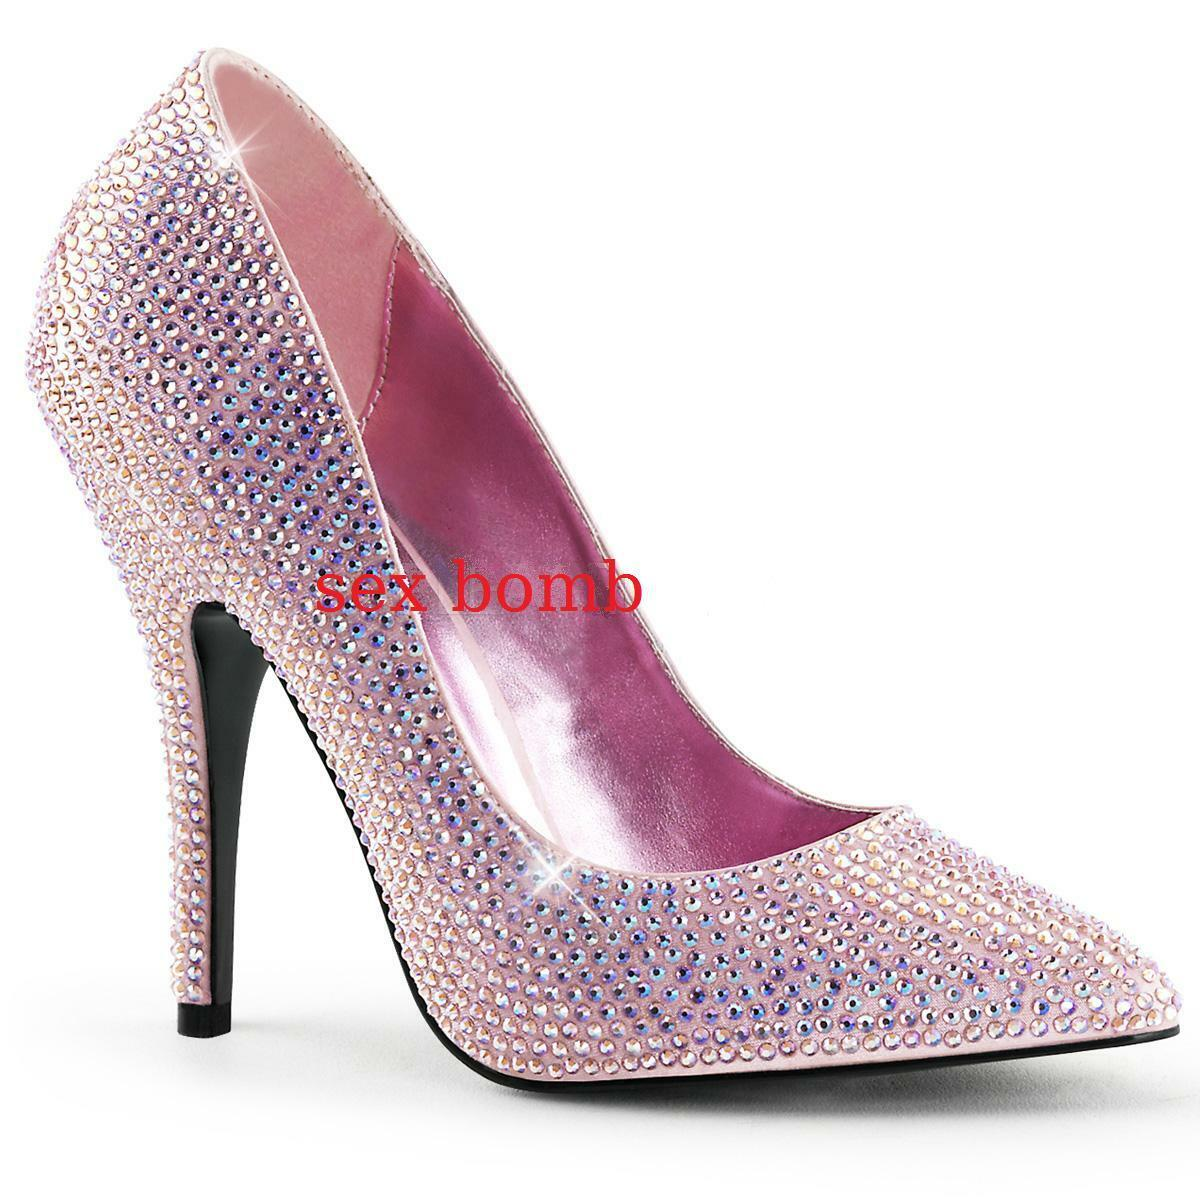 SEXY scarpe decolte raso STRASS tacco 13 cm ROSA BABY dal 35 al 41 GLAMOUR